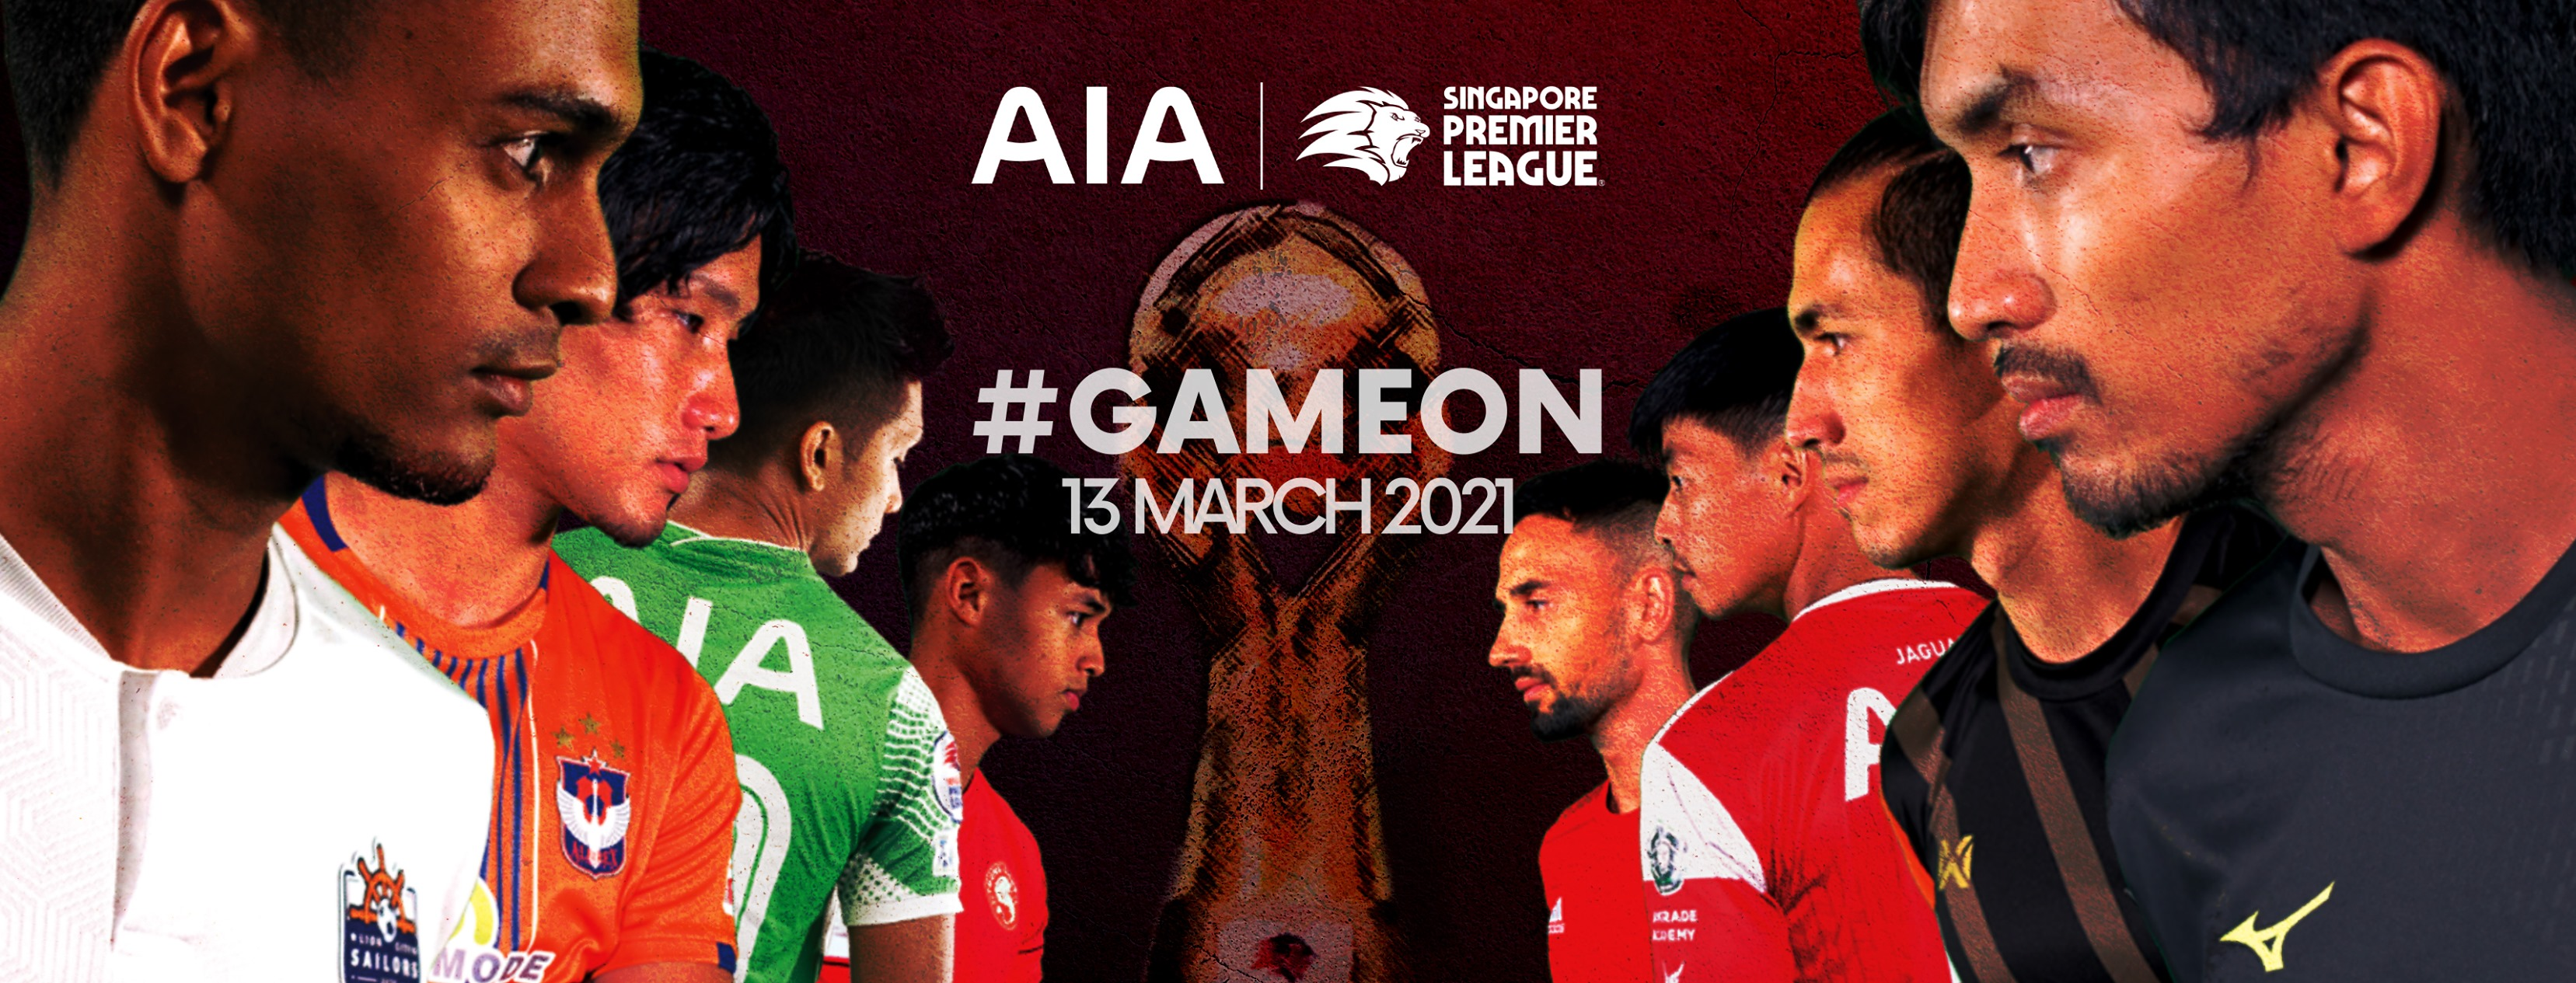 Final Countdown to the 2021 SPL Season!